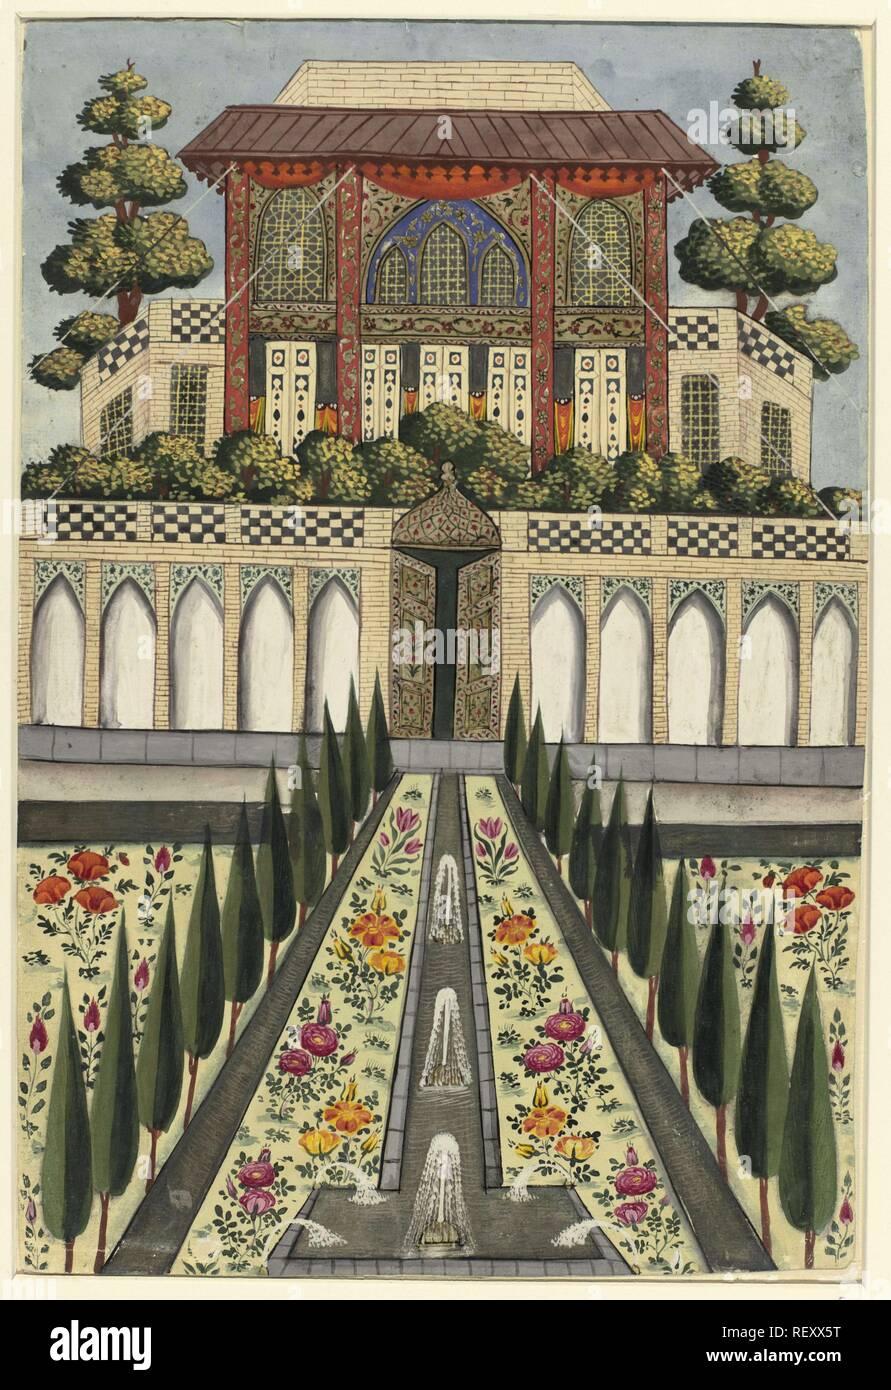 Palace Garden of Hazar Jarib in Aliabad. Draughtsman: anonymous. Dating: 1600 - 1649. Place: Iran. Measurements: h 330 mm × w 221 mm. Museum: Rijksmuseum, Amsterdam. - Stock Image